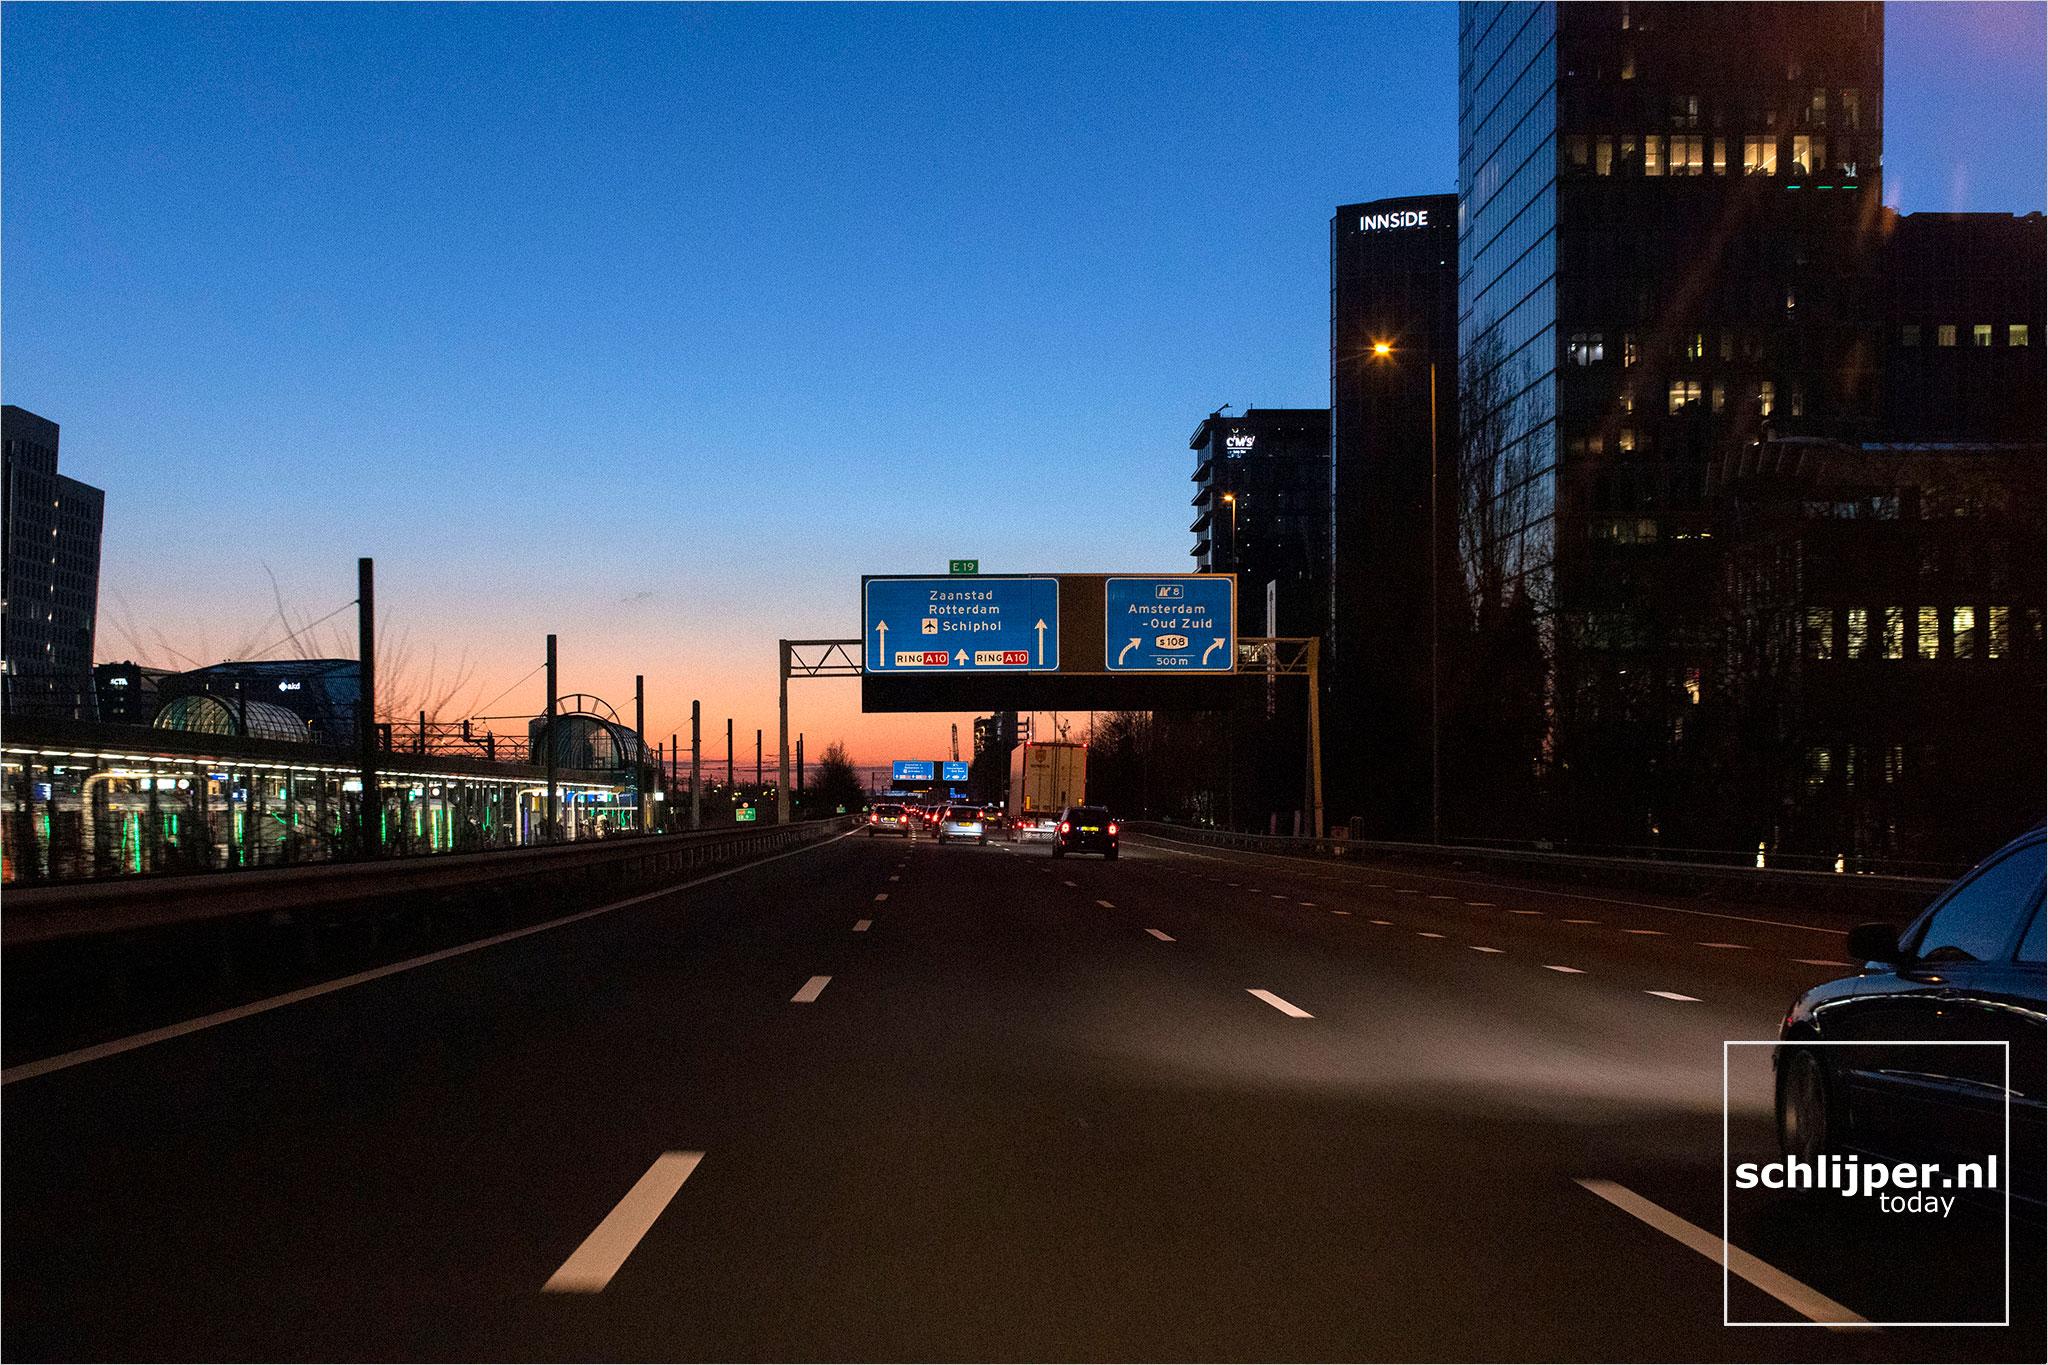 The Netherlands, Amsterdam, 6 maart 2021